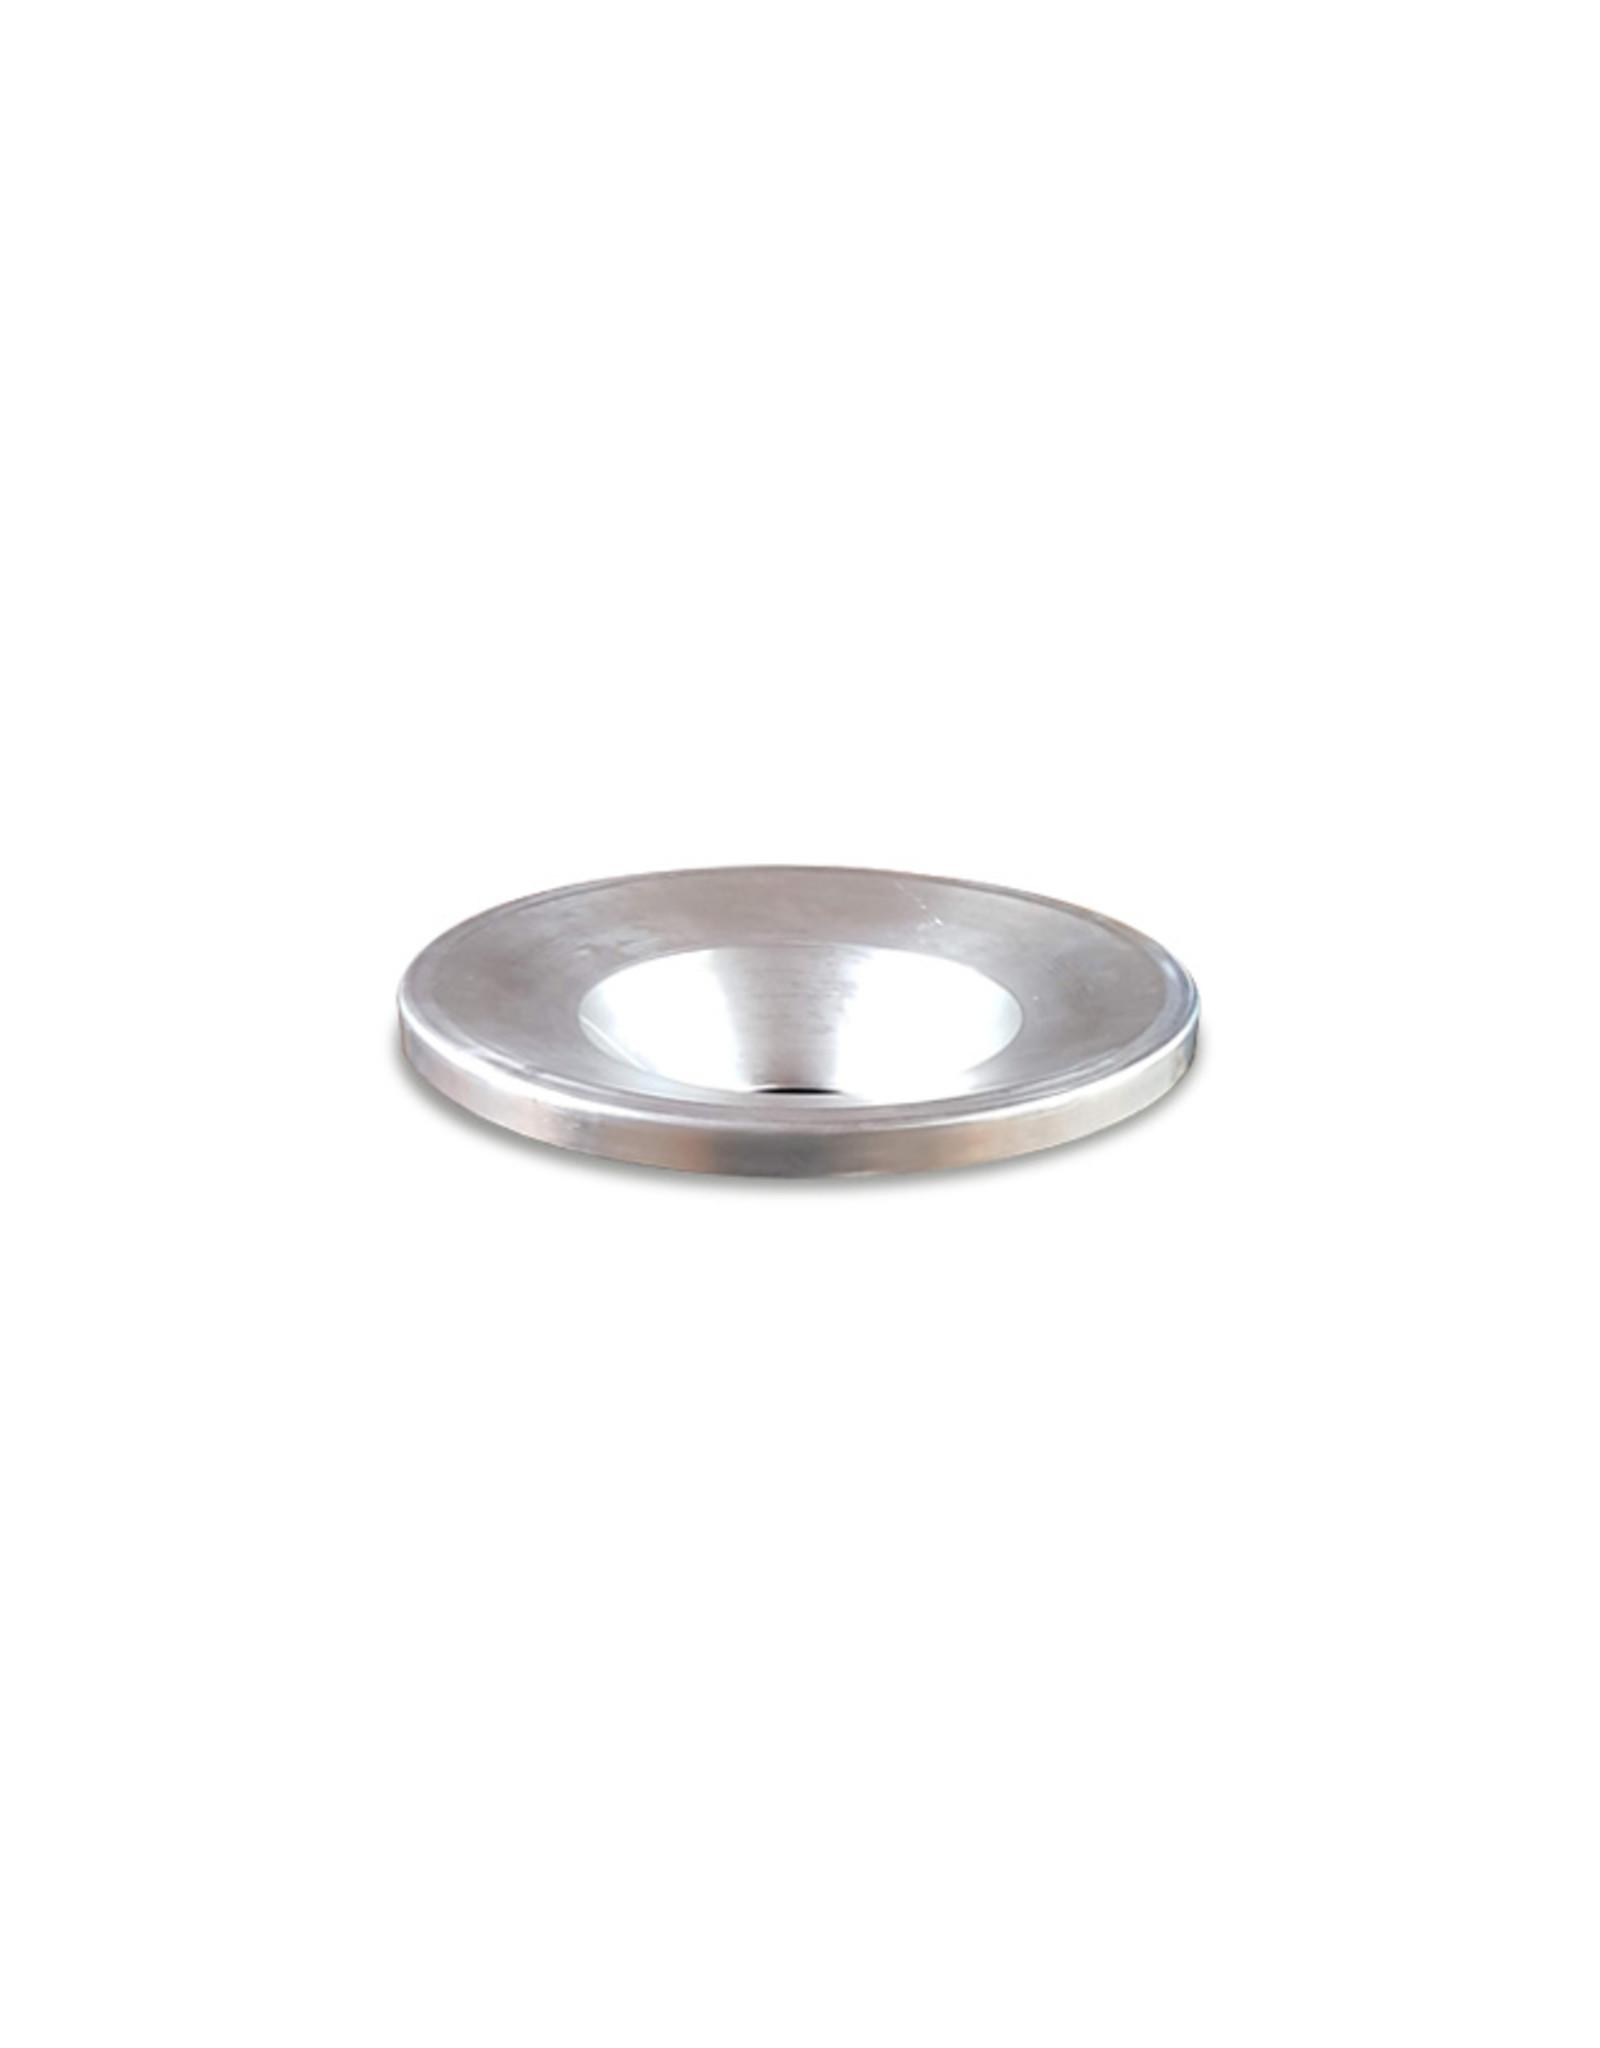 The Binbin Flame-retardant lid for a 120L drum